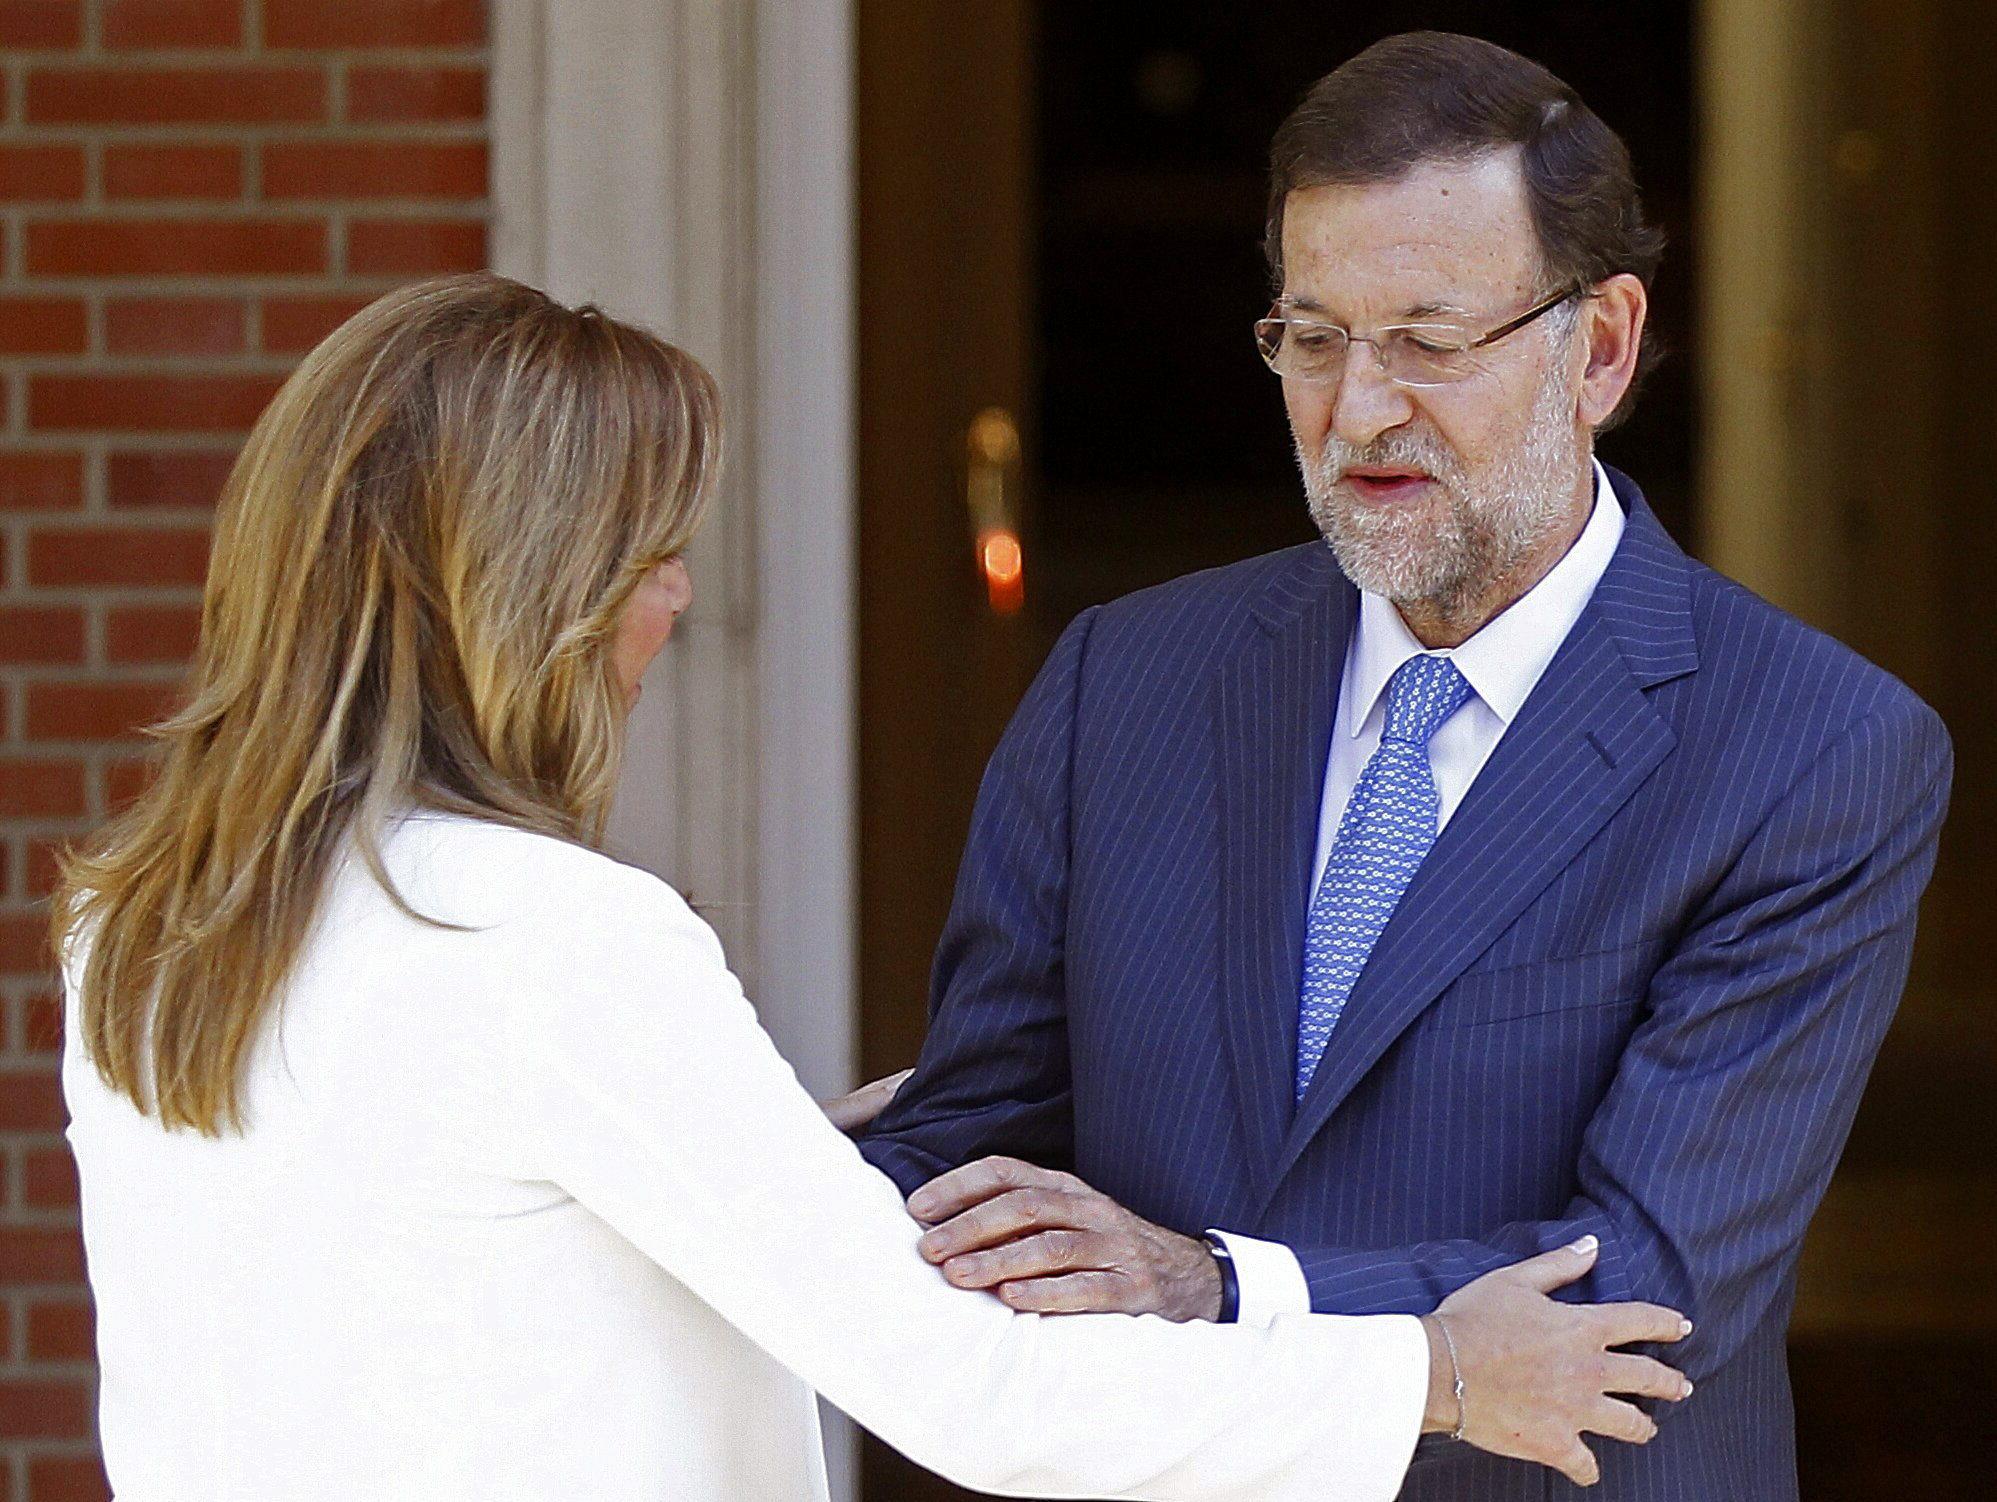 Díaz ve a Rajoy receptivo al pacto anticorrupción, que no choca con Rubalcaba